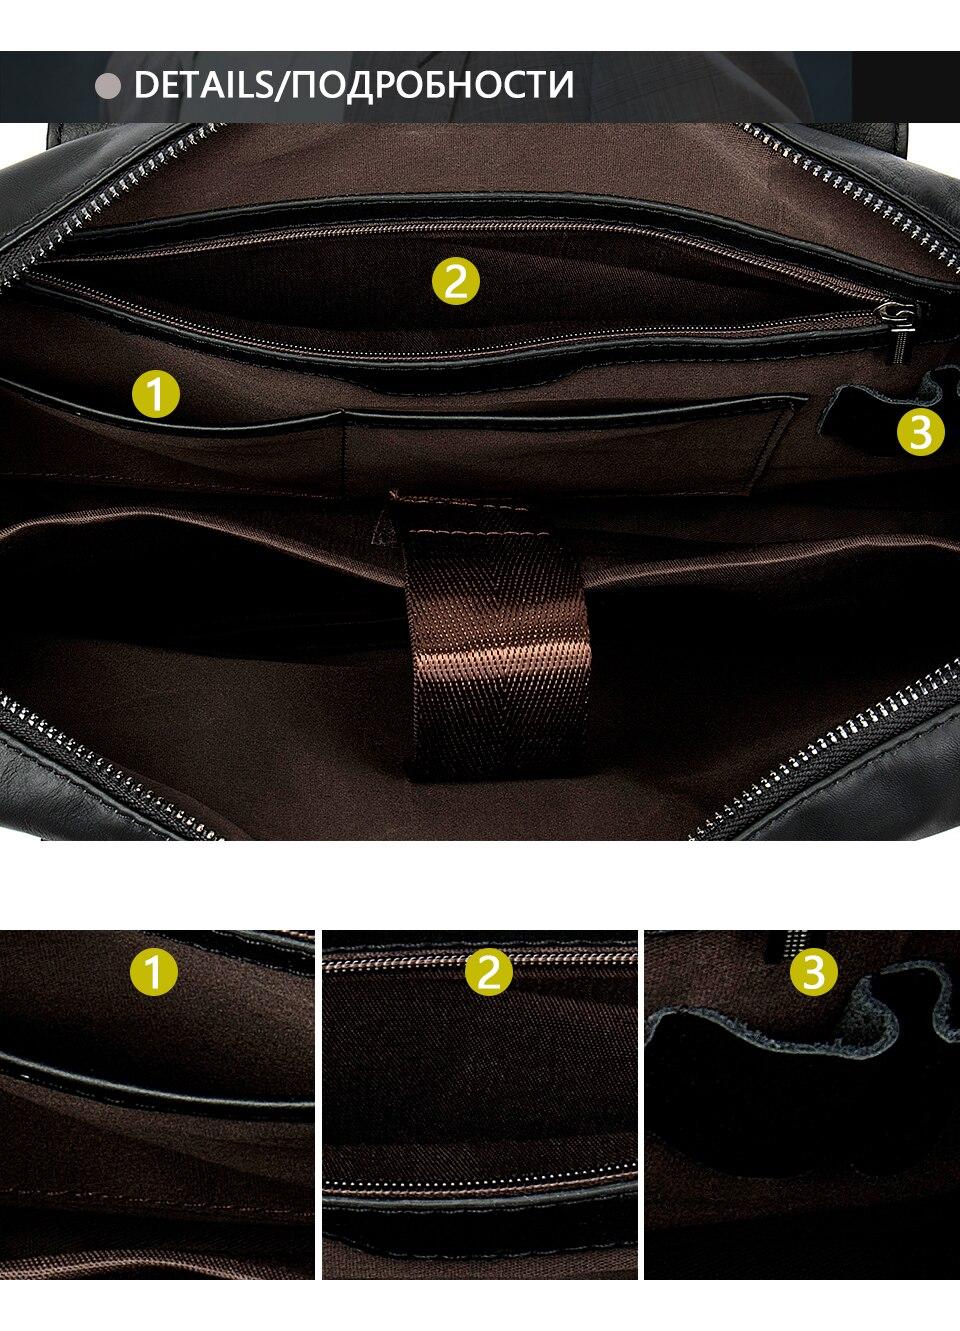 HTB1BsZtboLrK1Rjy1zbq6AenFXaz WESTAL genuine leather bag for men's briefcase bussiness laptop bags for documents messenger handbags tote briefcase 9005